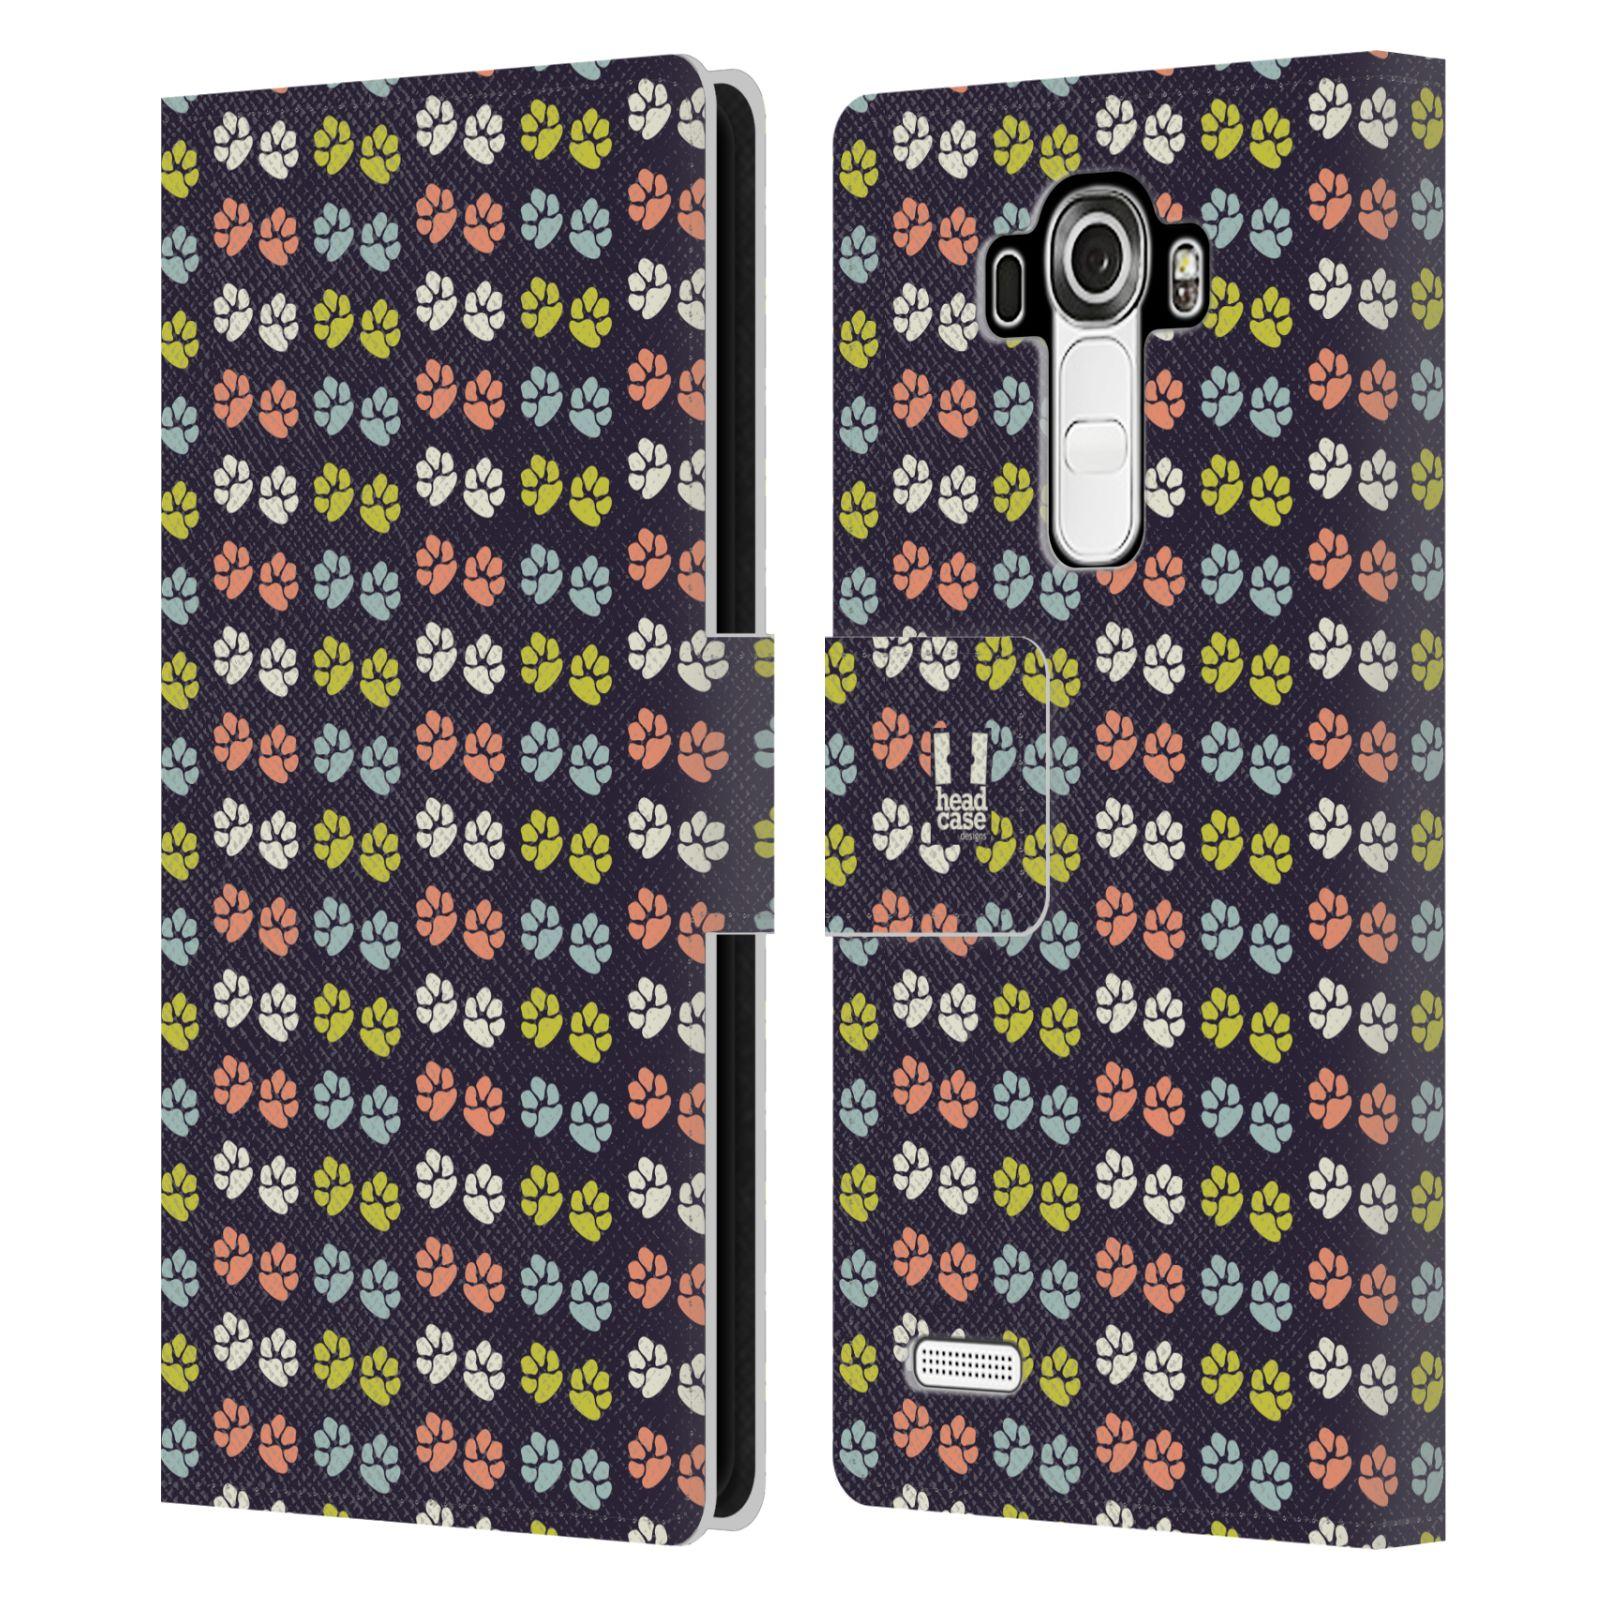 HEAD CASE Flipové pouzdro pro mobil LG G4 (H815) Pejsek ťapky barevné RETRO